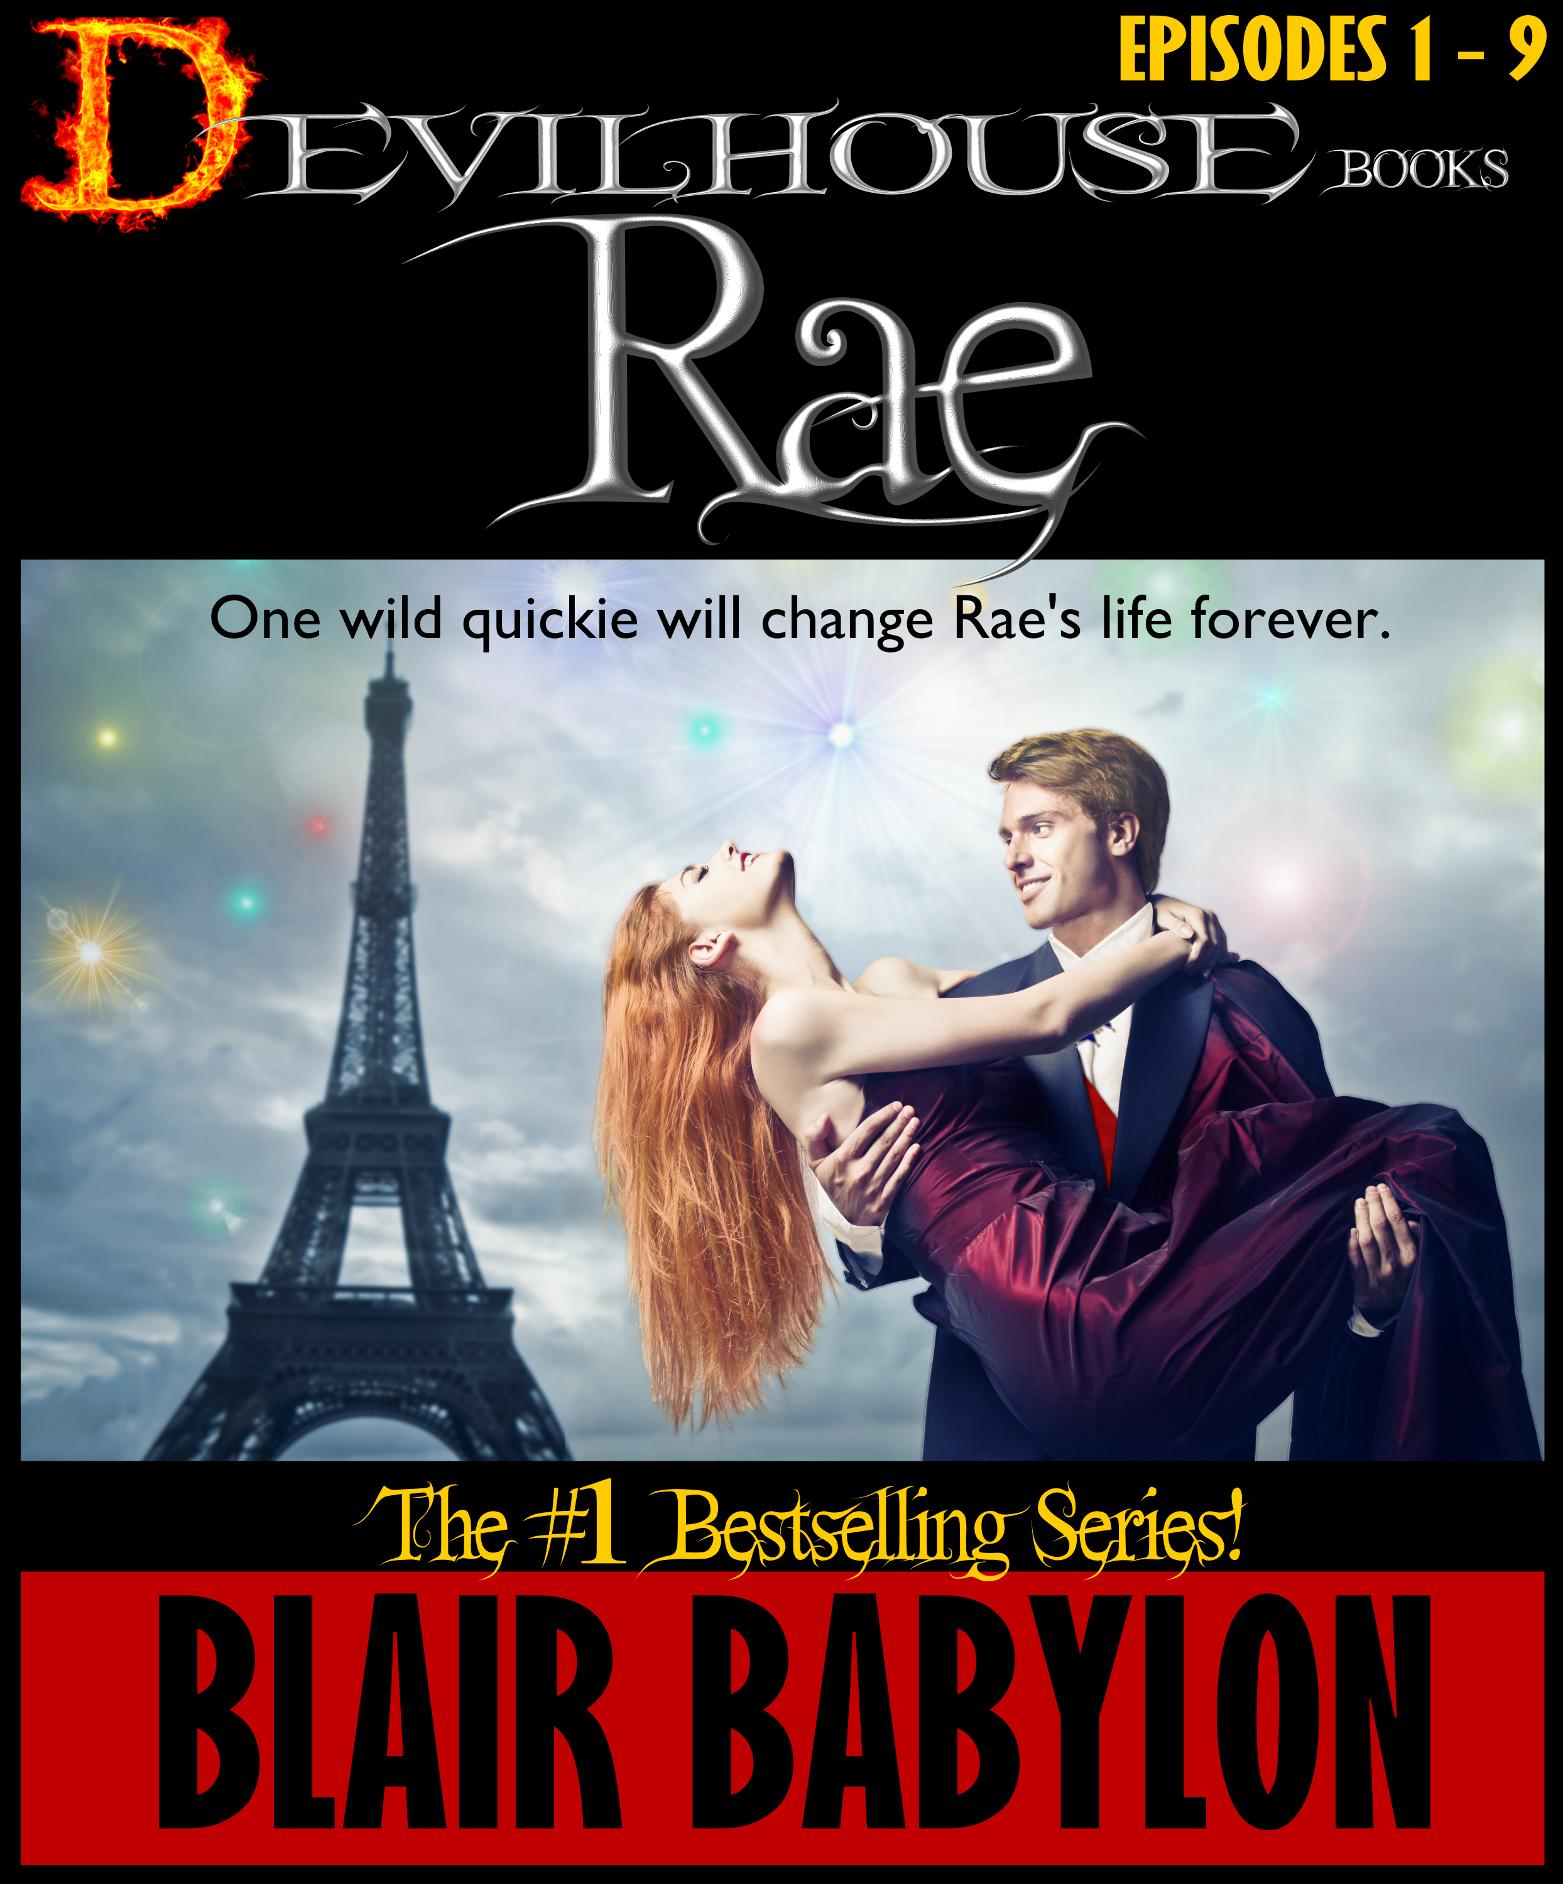 Blair Babylon - The Devilhouse Books: Rae, Episodes 1-9 Omnibus Edition